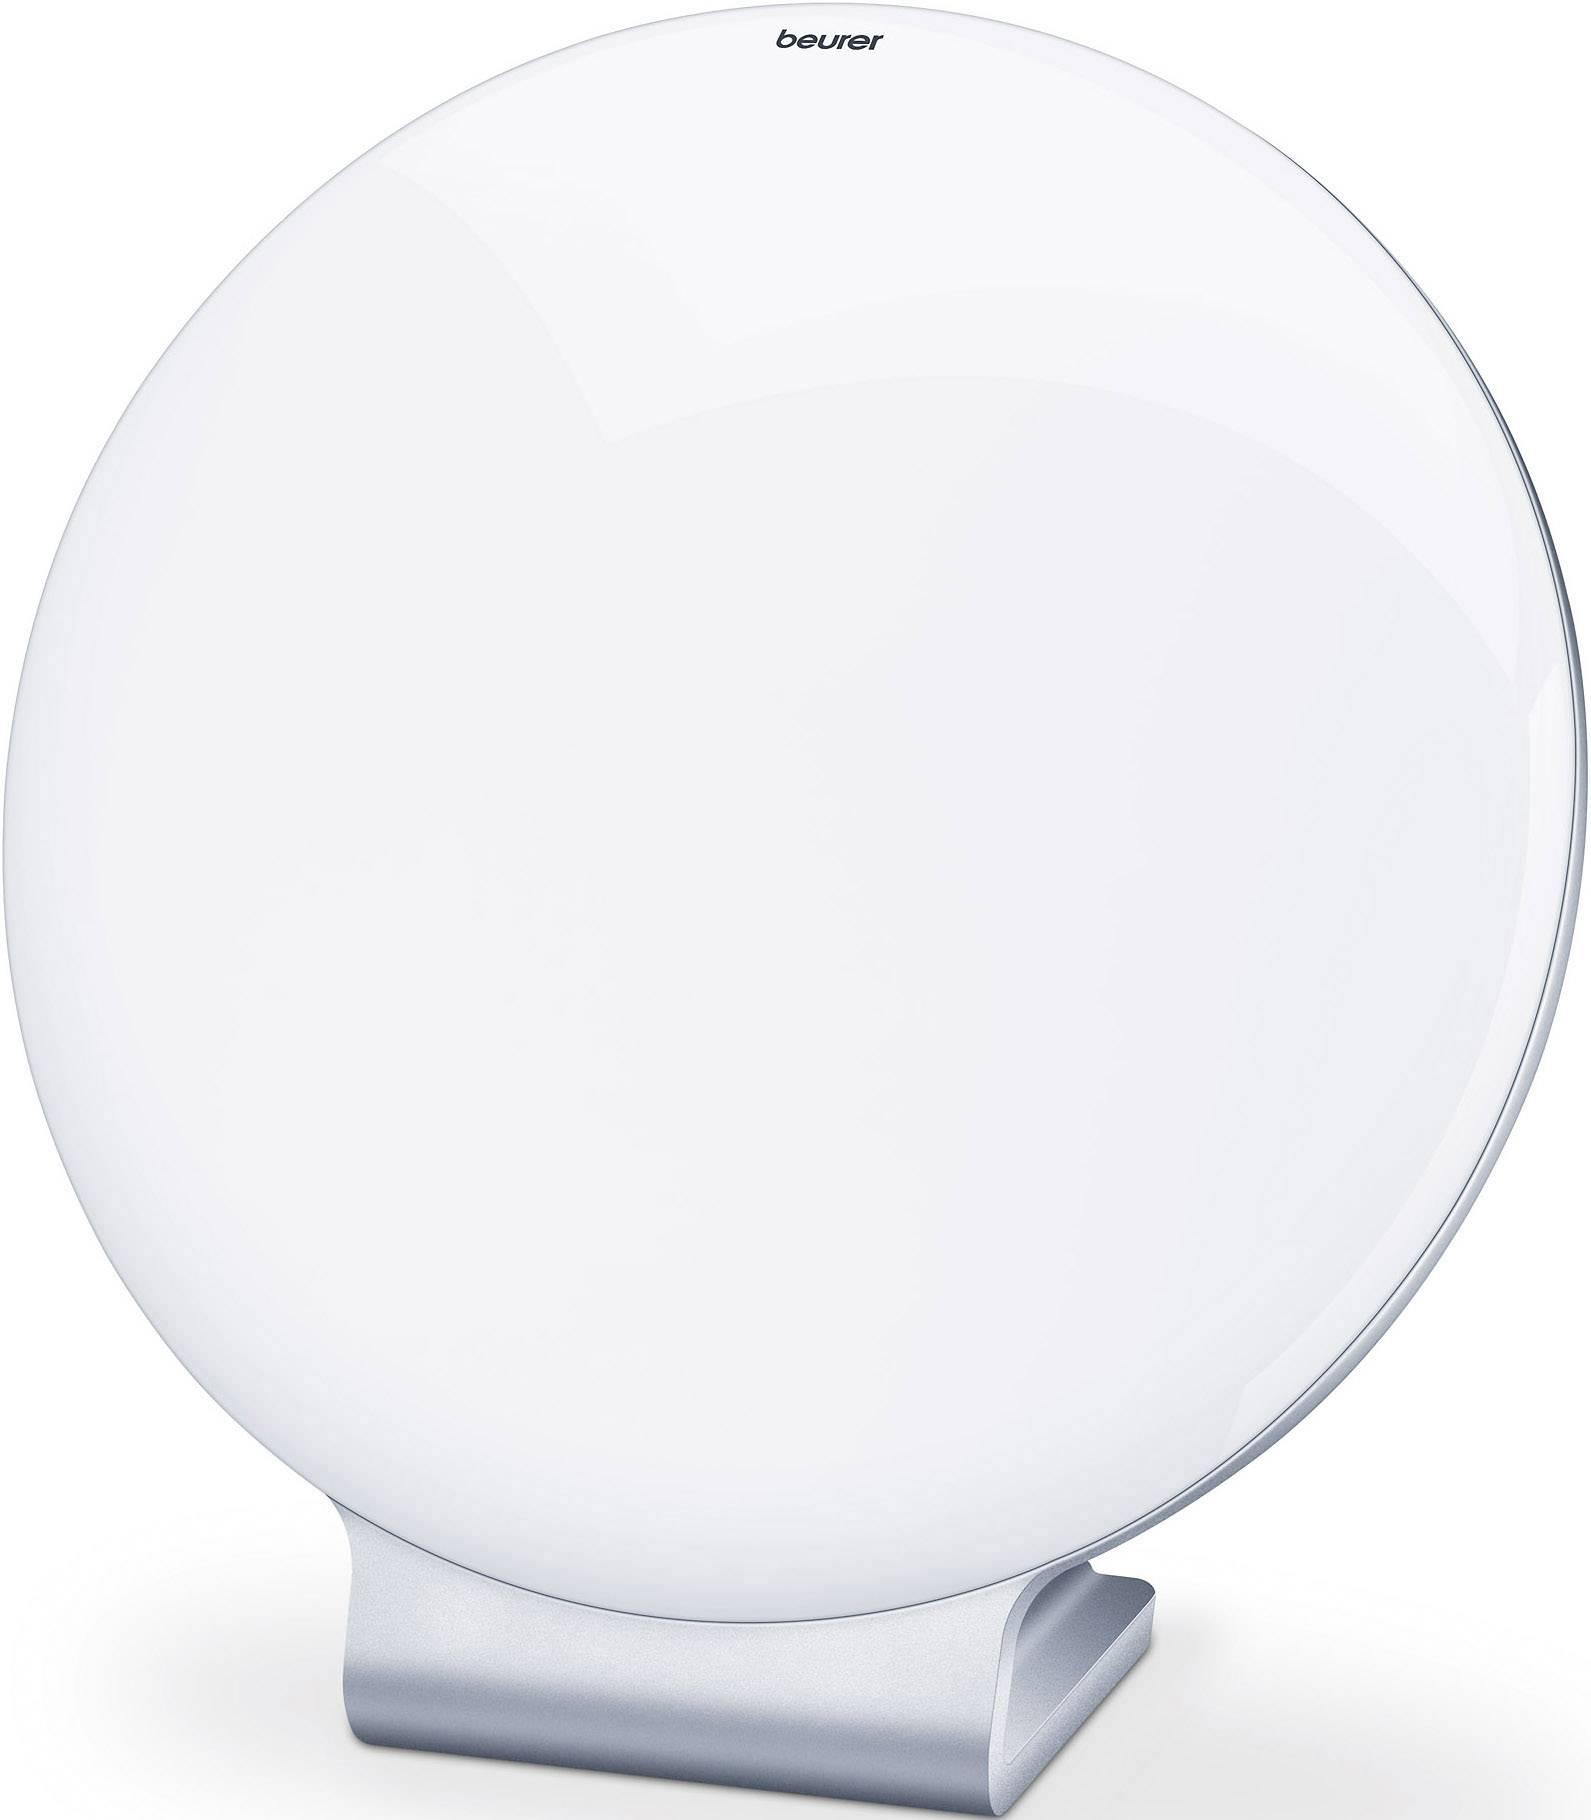 Lampa denného svetla Beurer TL 50, biela